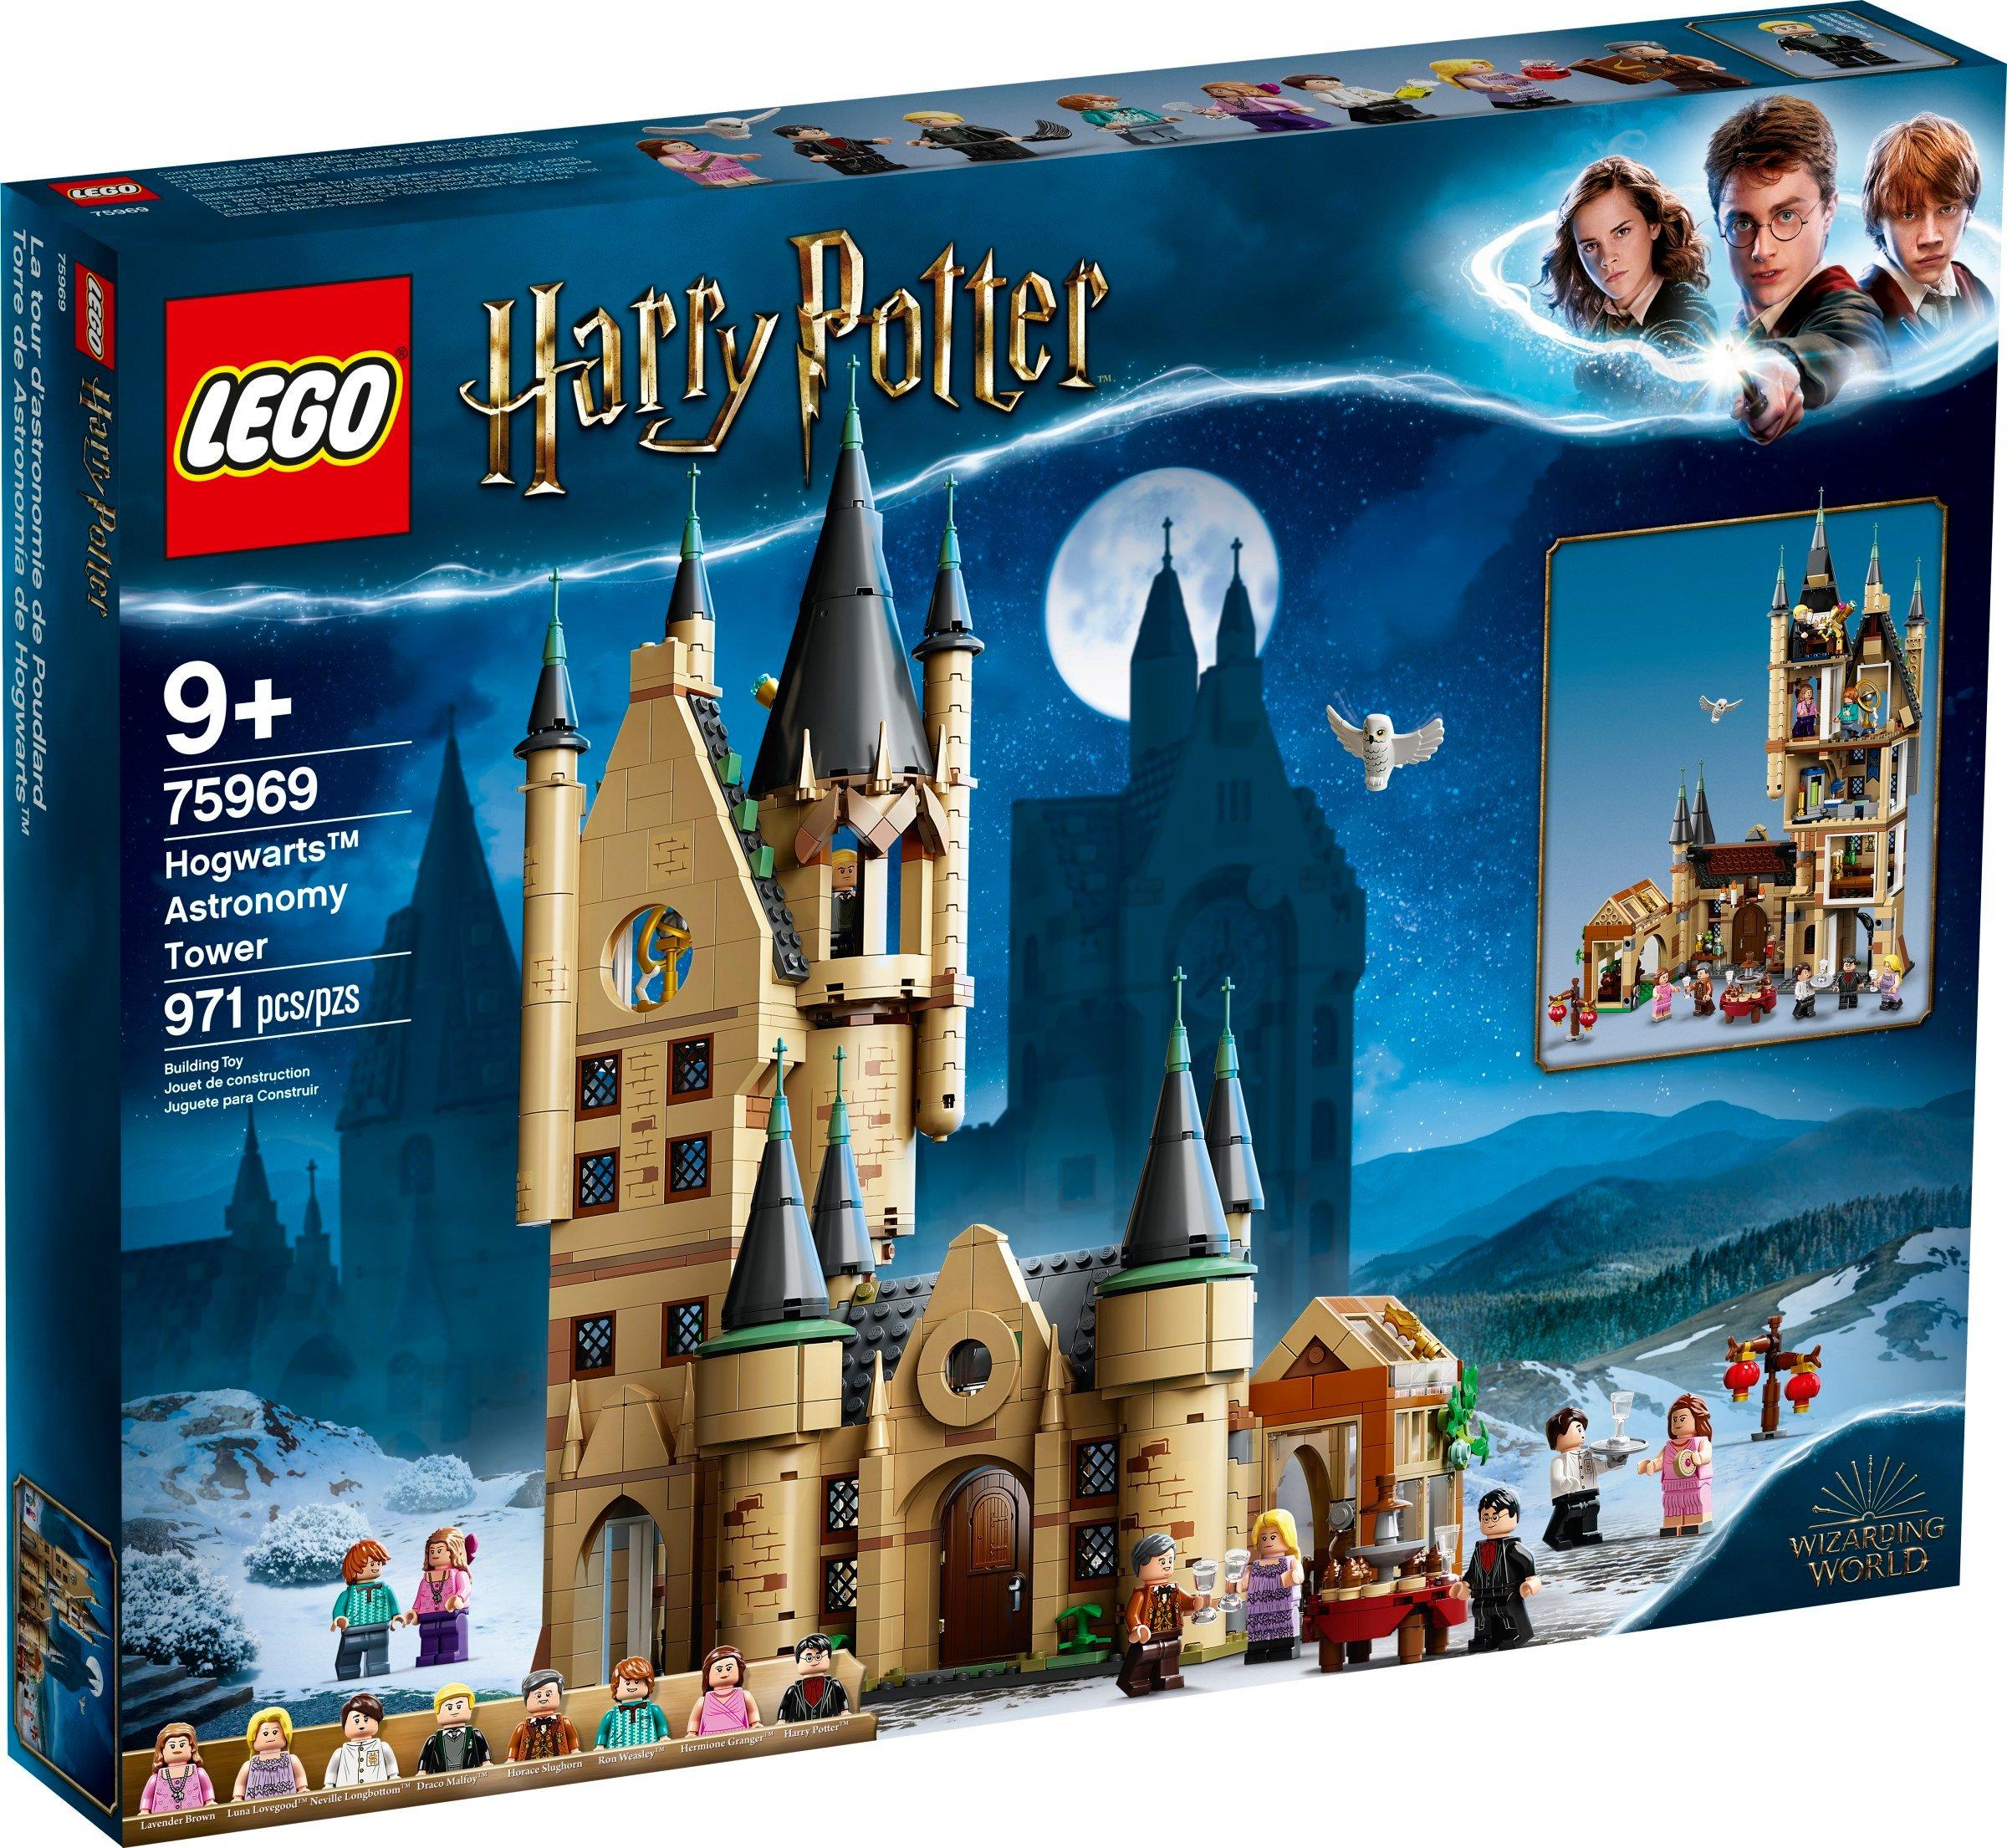 LEGO Harry Potter - Hogwarts Astronomy Tower (75969)